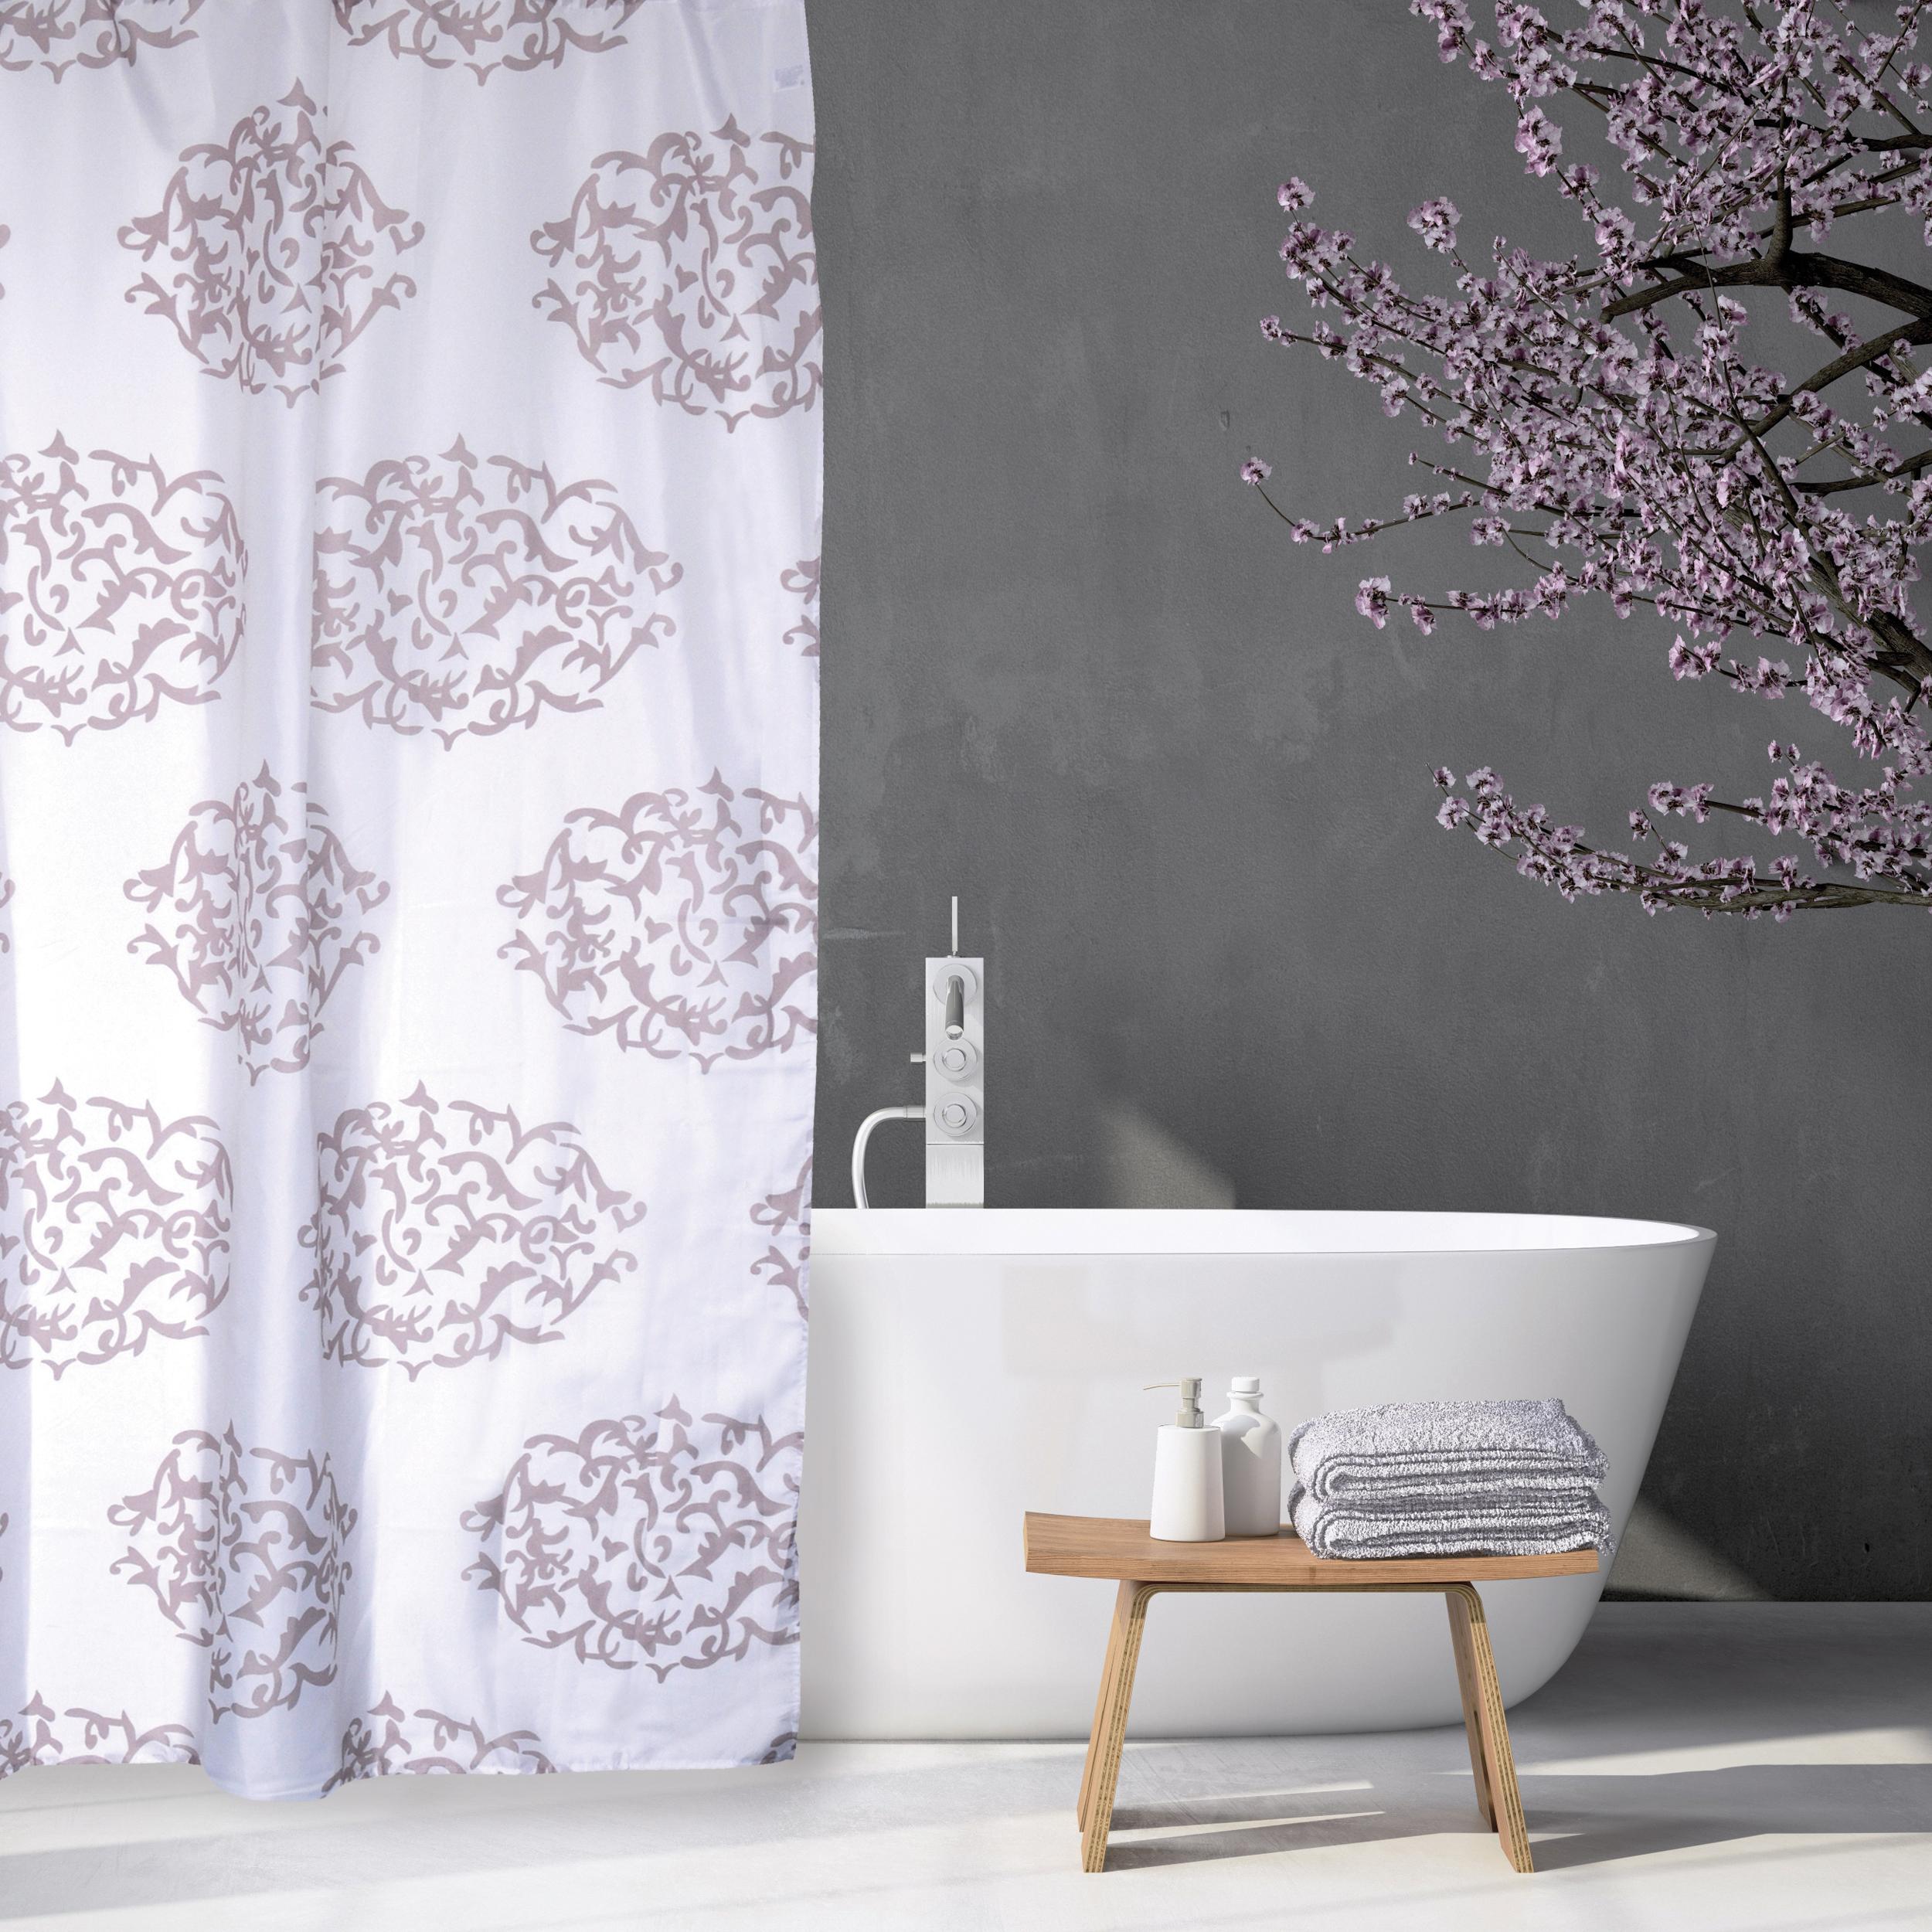 MSV Duschvorhang 180x200cm Anti Schimmel Textil Badewannenvorhang Wannenvorhang Baroque